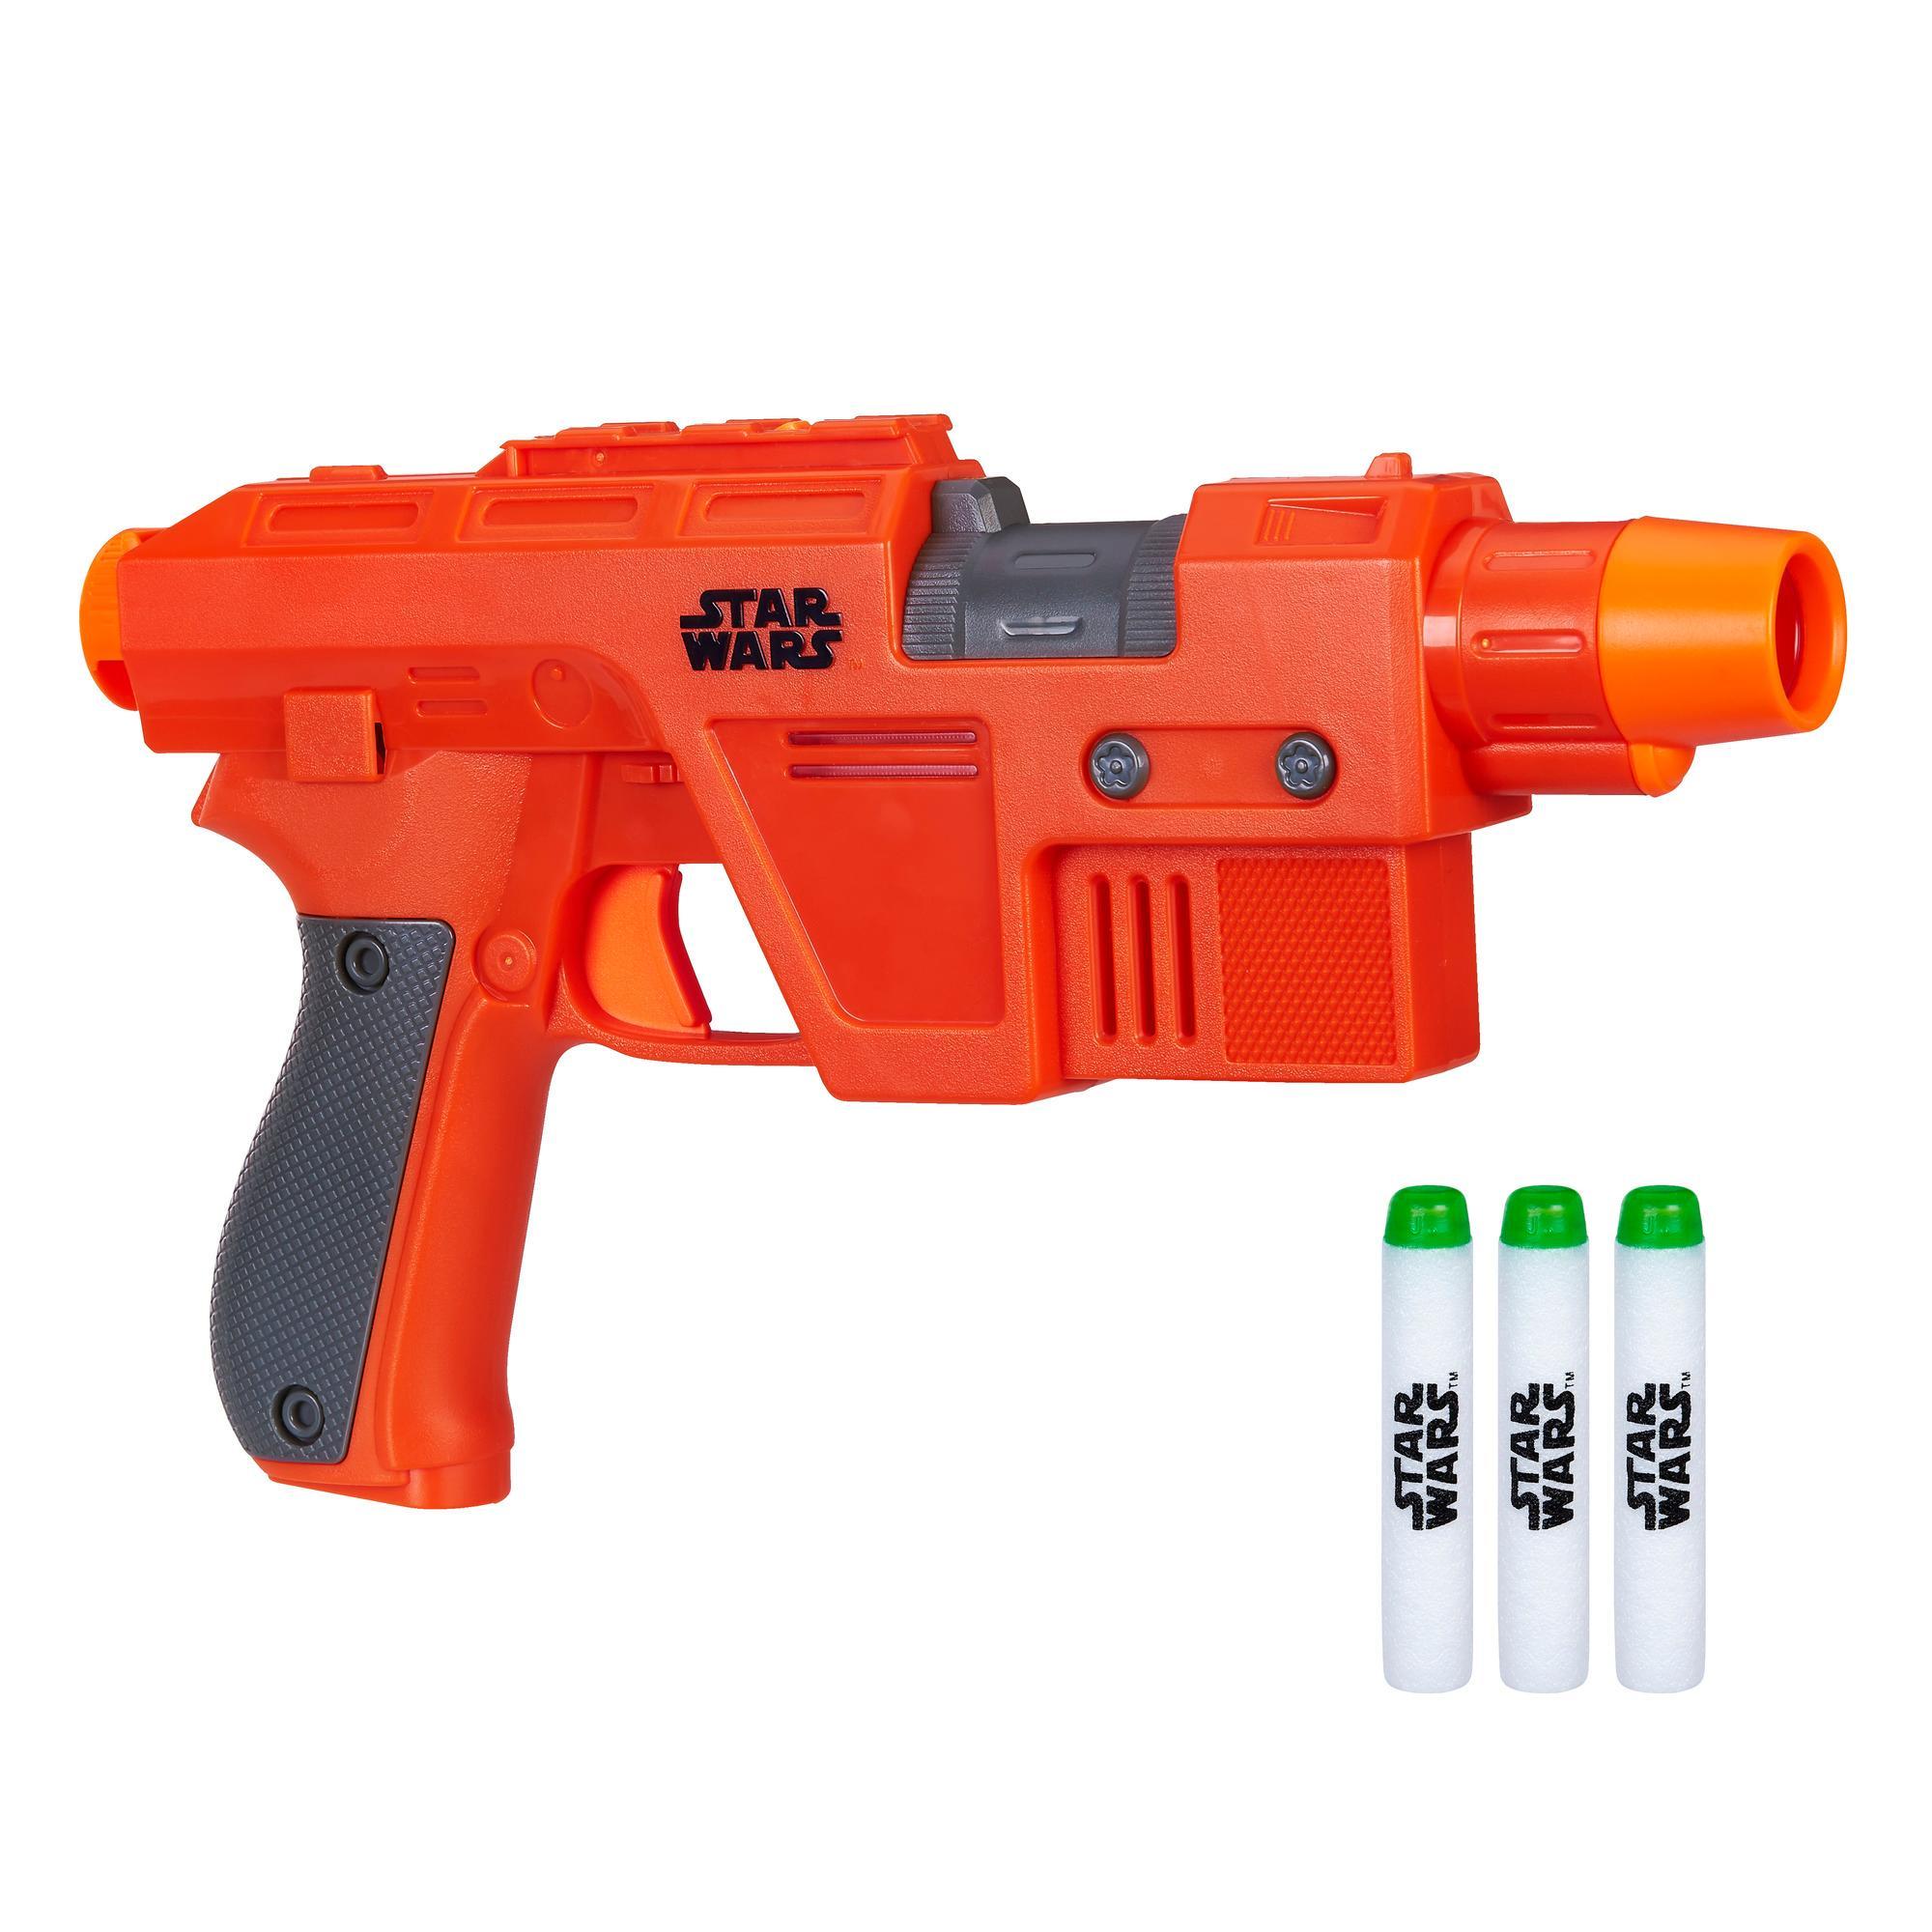 SW E8 Beta 2 blaster